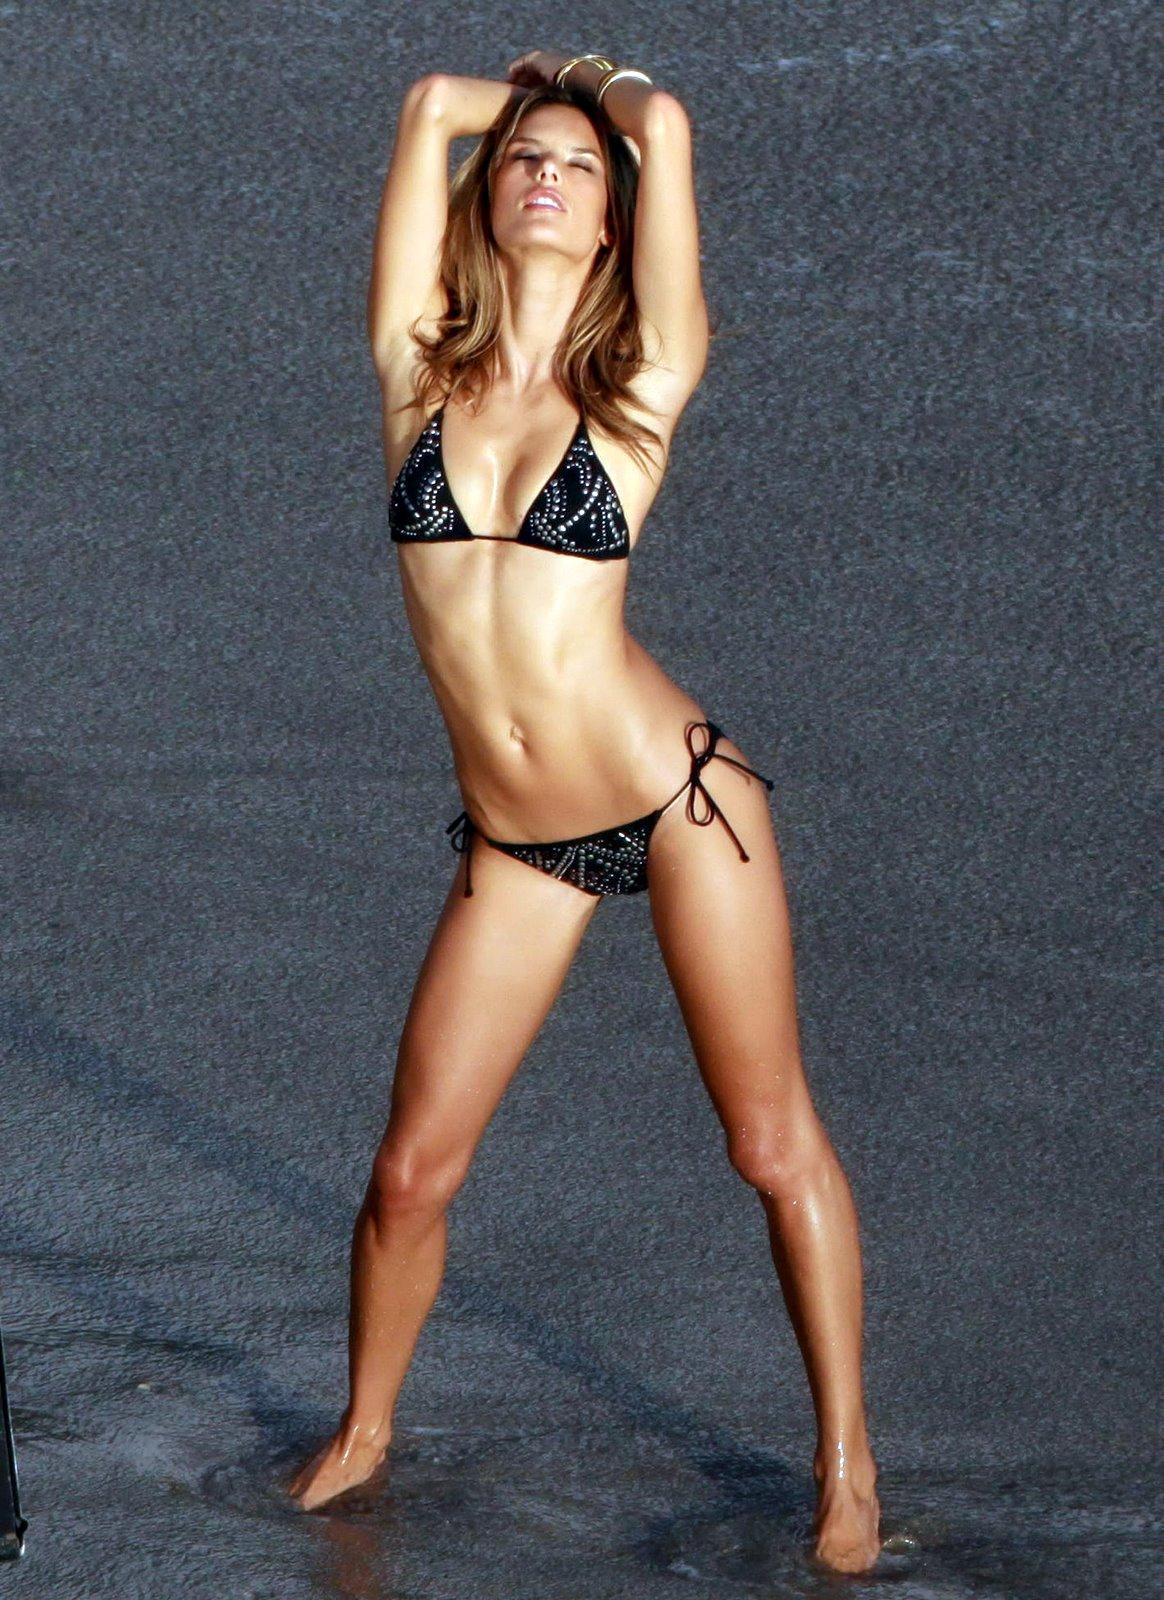 [Alessandra_Ambrosio_Bikini_09110055.jpg]